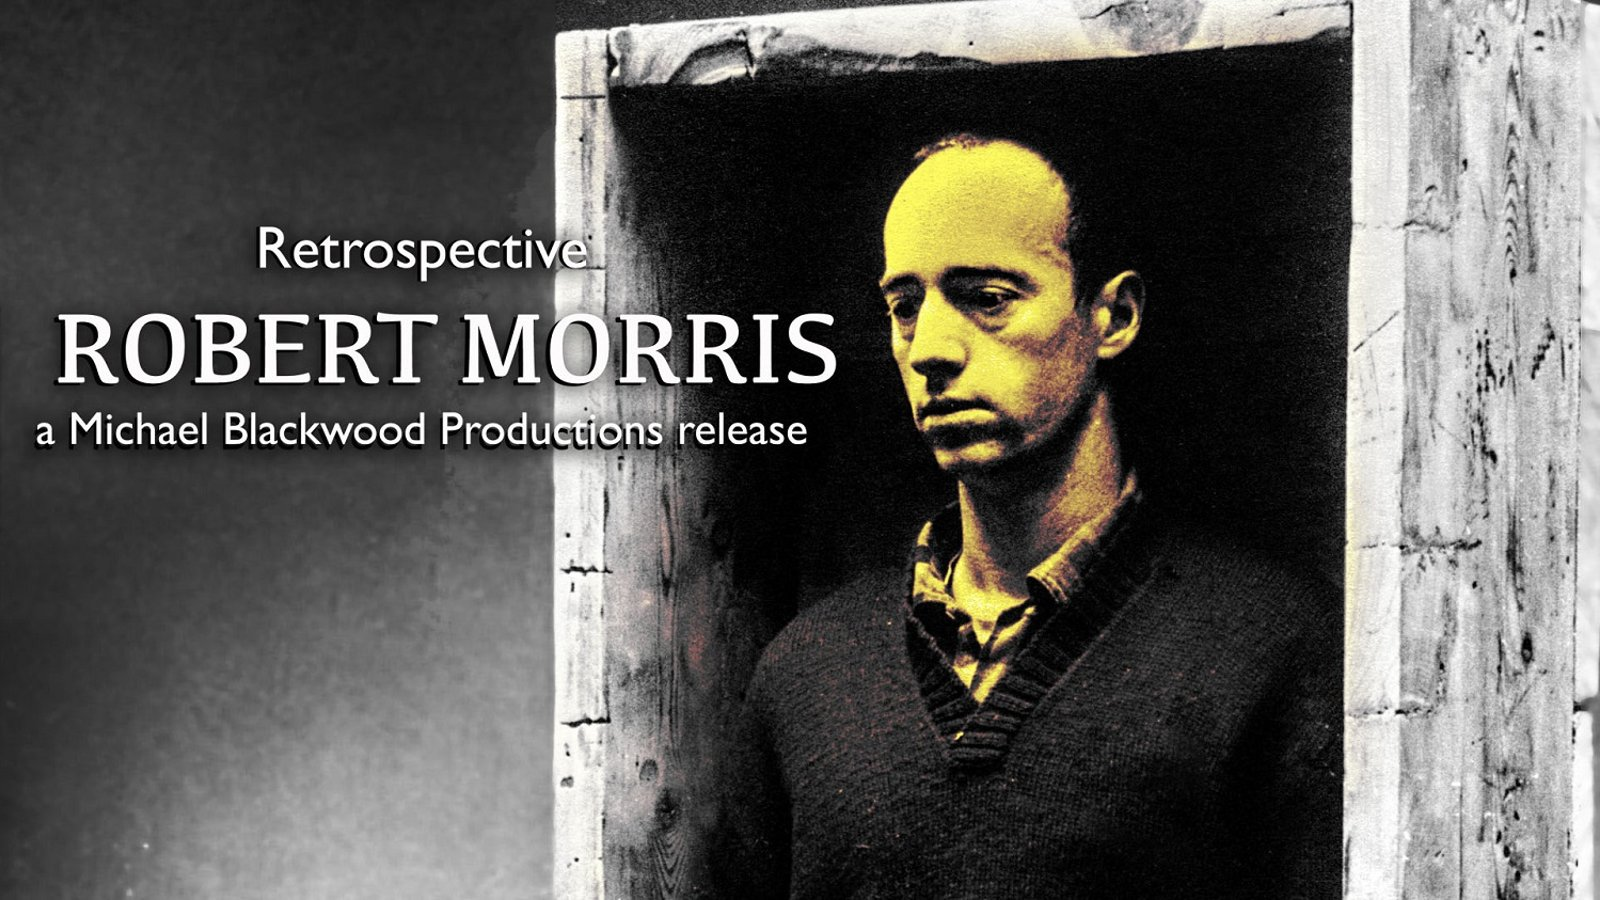 Robert Morris: Retrospective